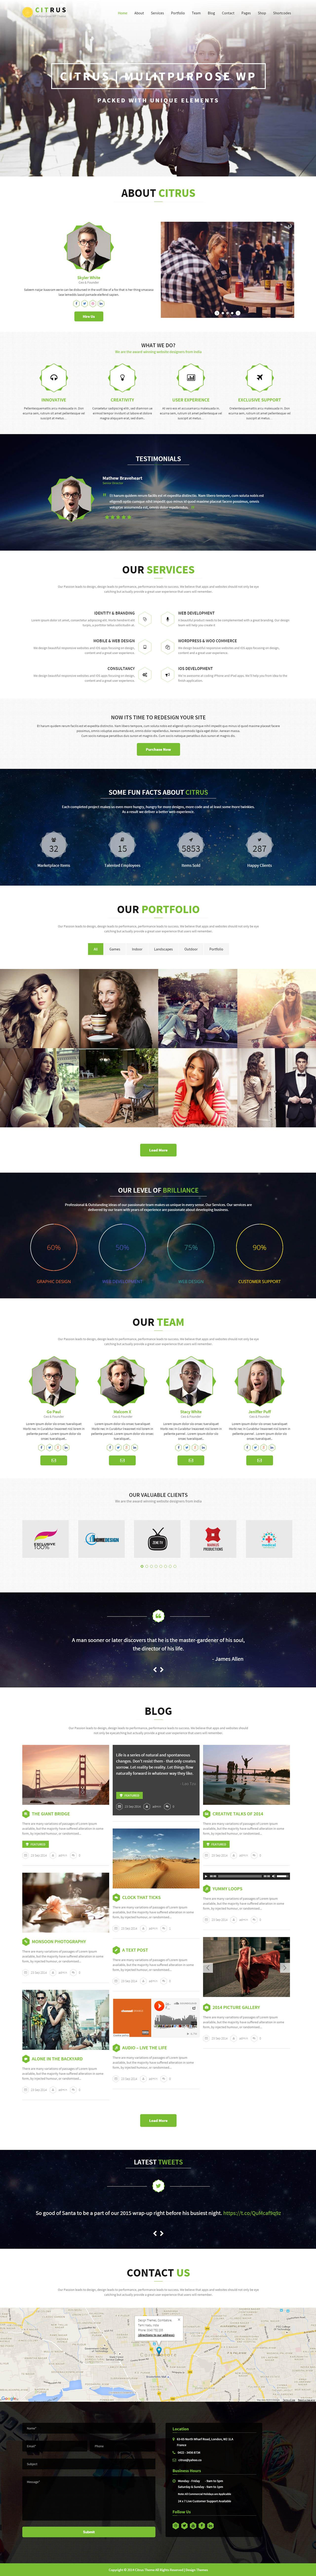 Citrus Website Screenshot